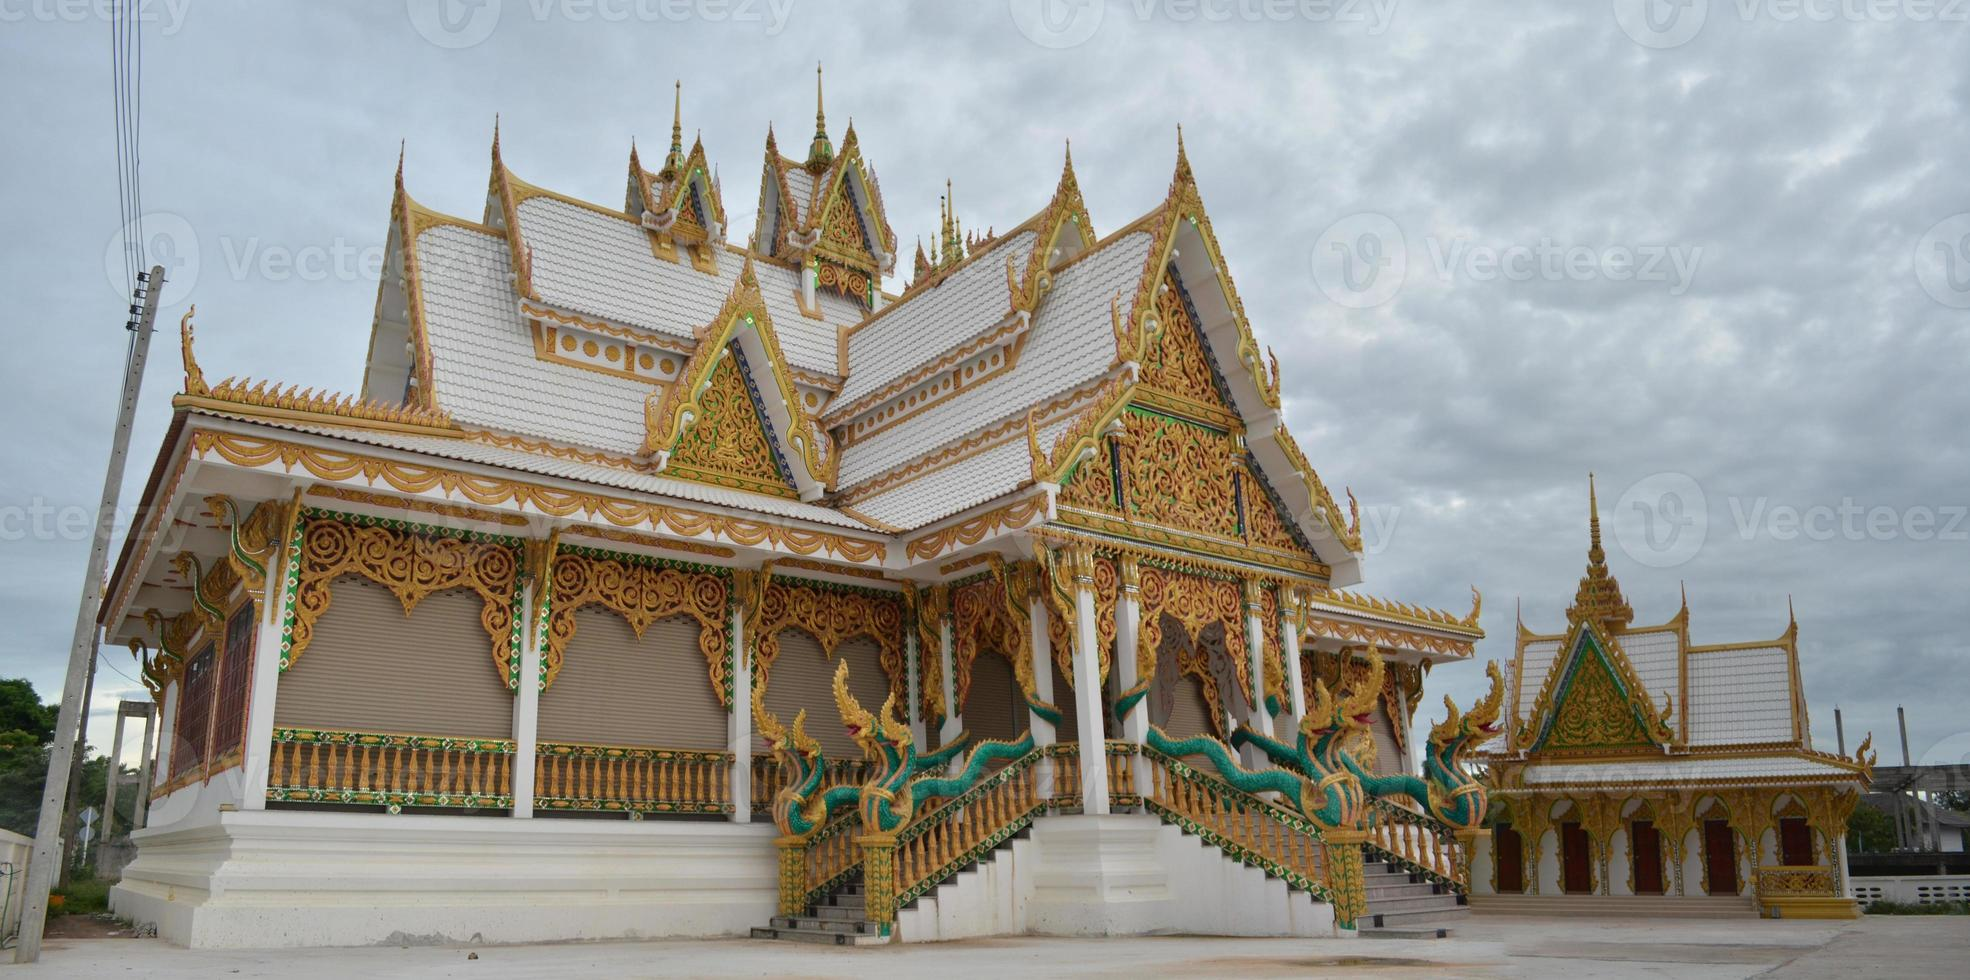 gran templo dorado tailandia foto